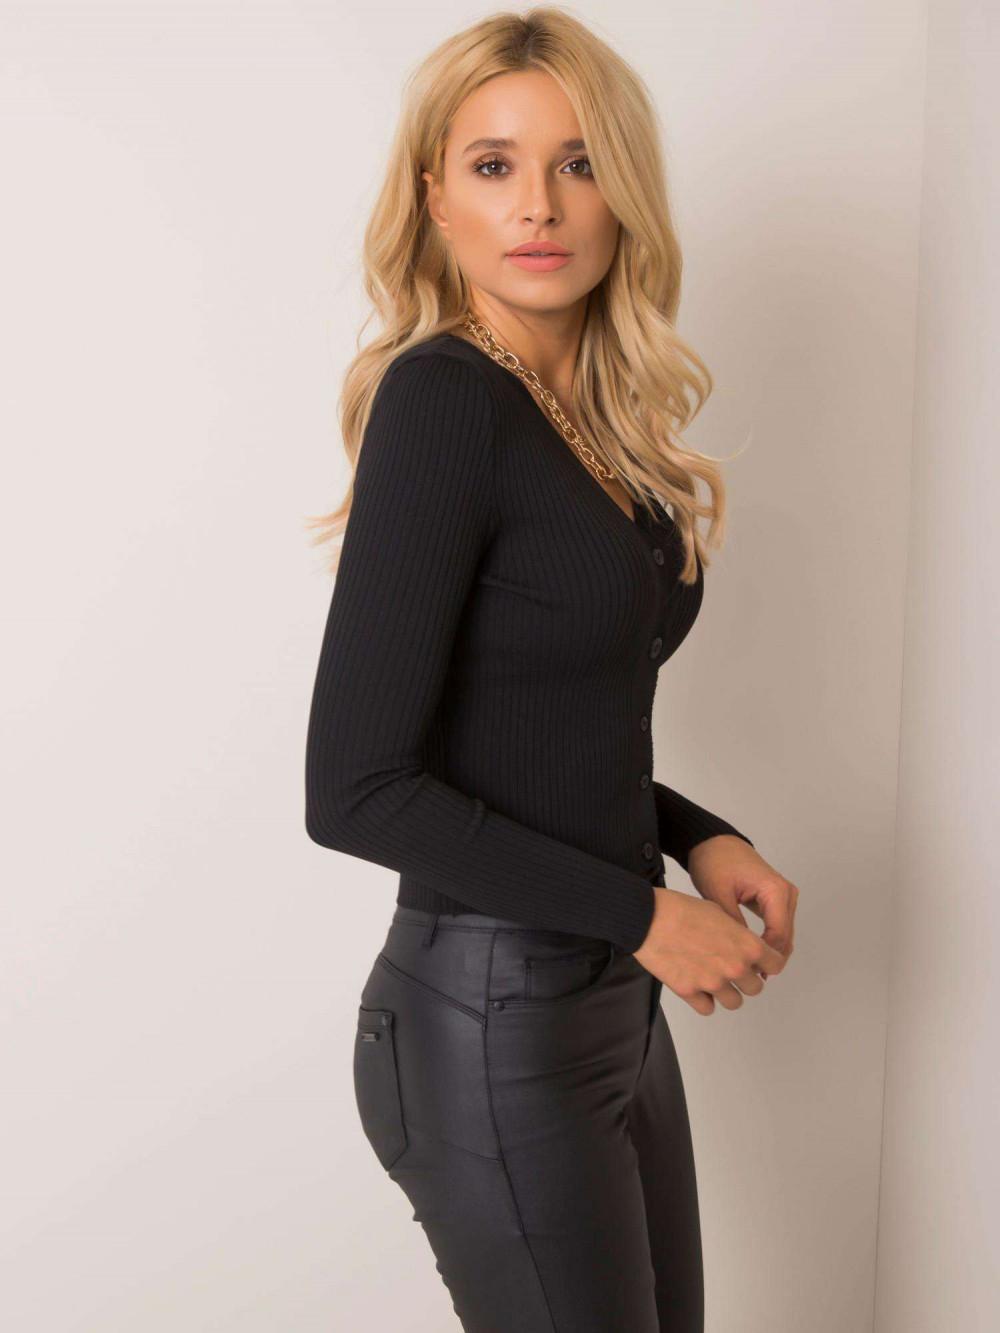 Czarny sweter rozpinany Cannes 2